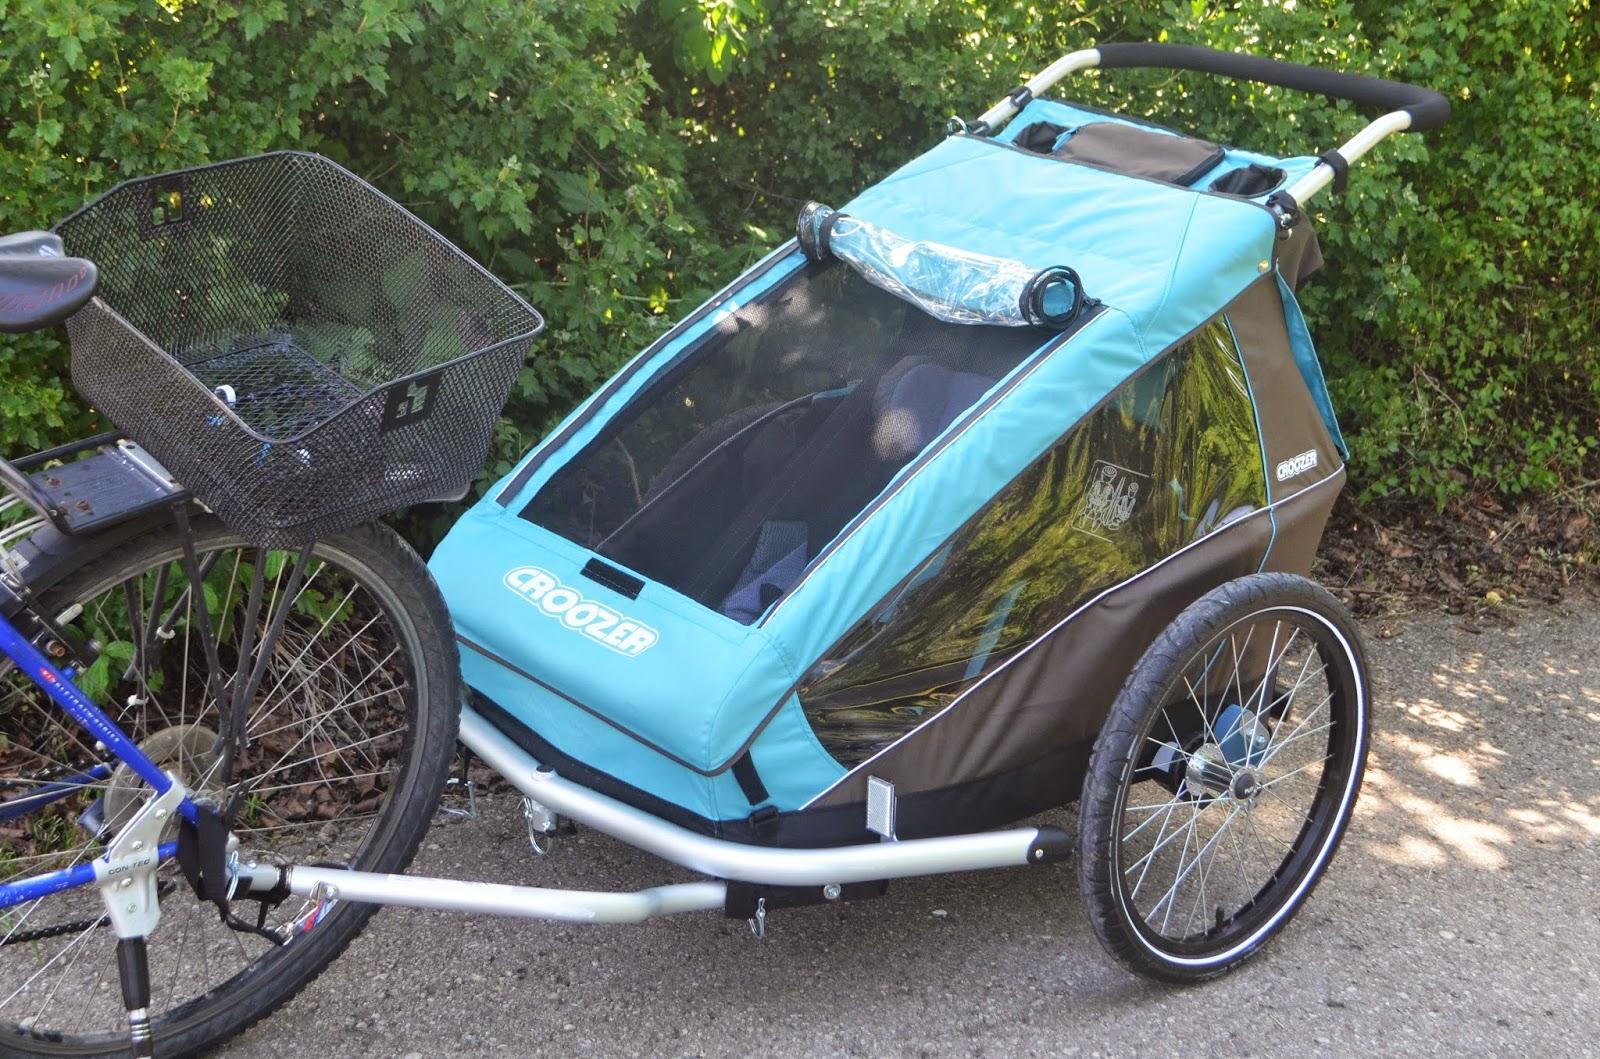 fahrradwimpel sicherheitswimpel fahrradfahne z b f r. Black Bedroom Furniture Sets. Home Design Ideas